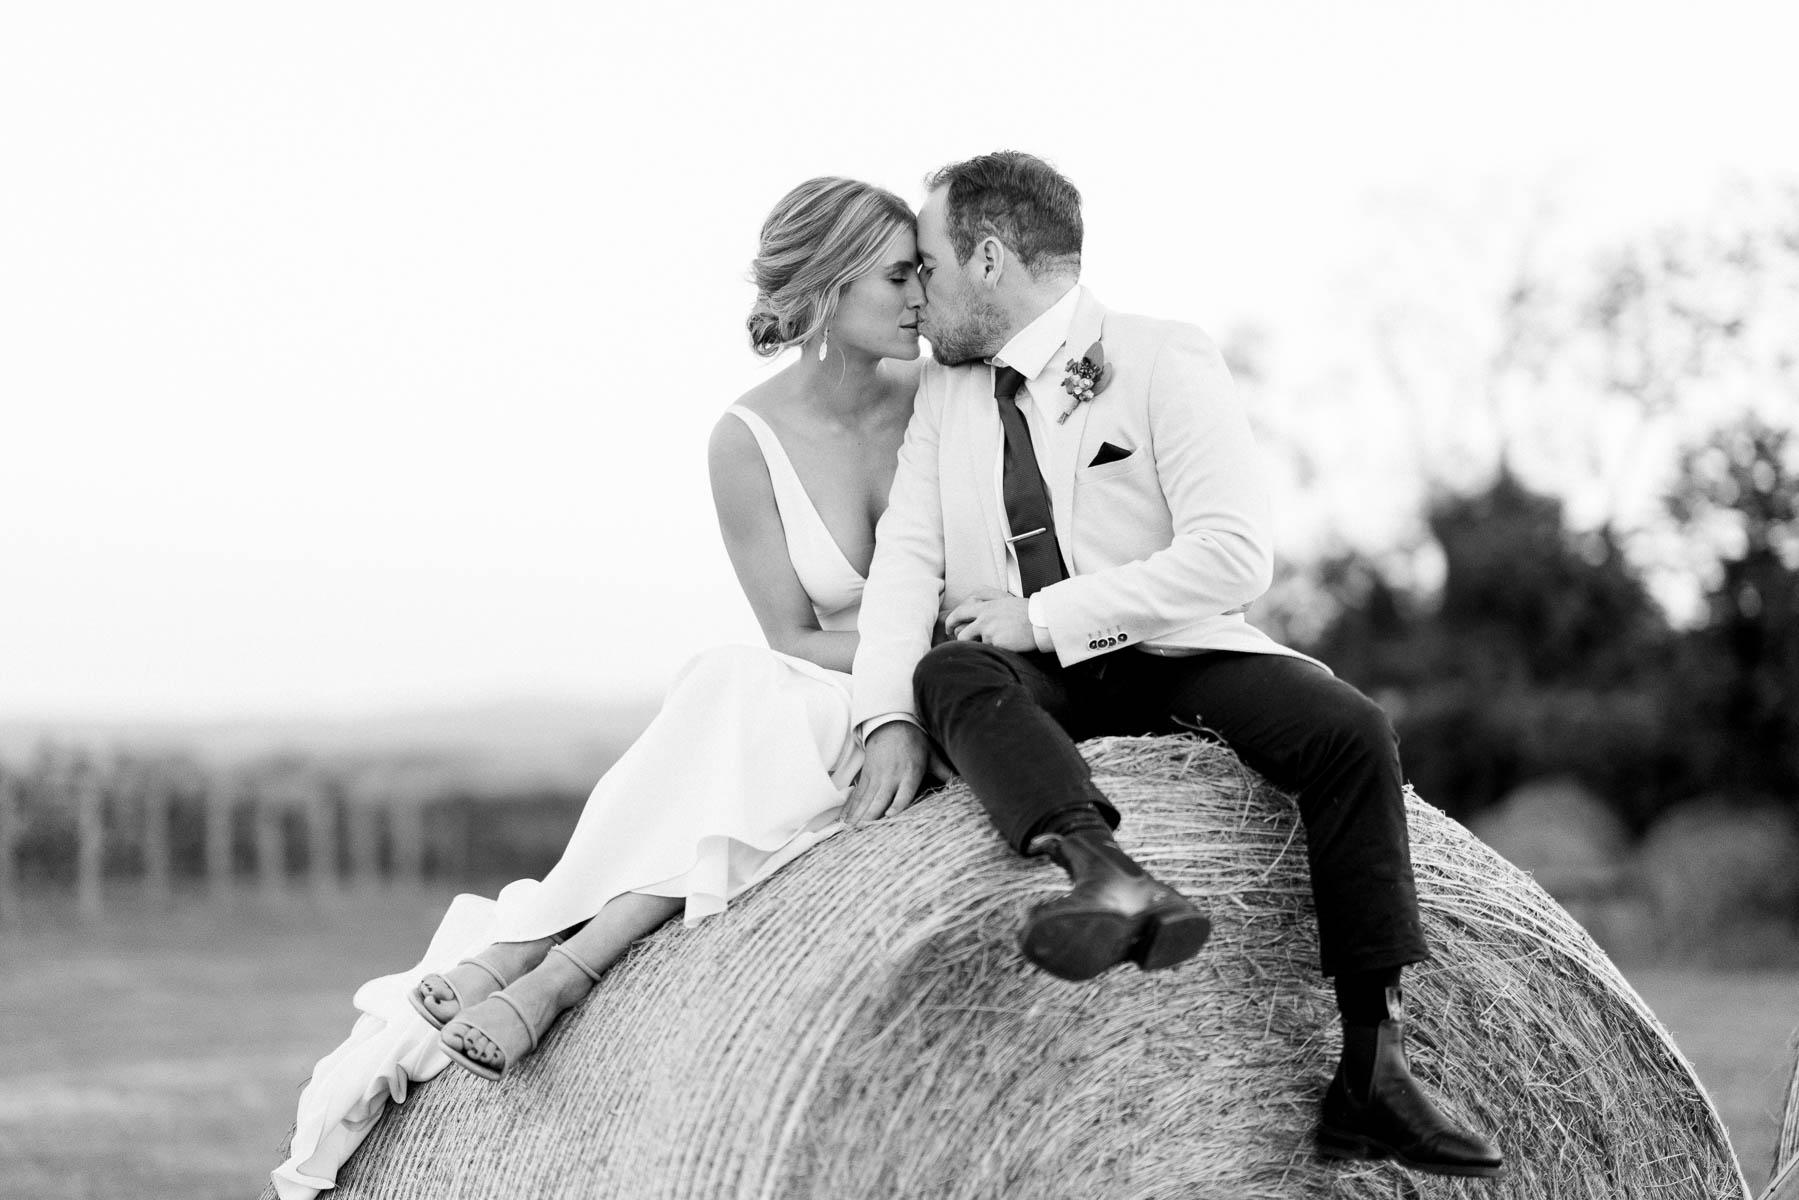 rustic-yarra-valley-wedding-venue-acacia-ridge-georgia-james-08394.jpg